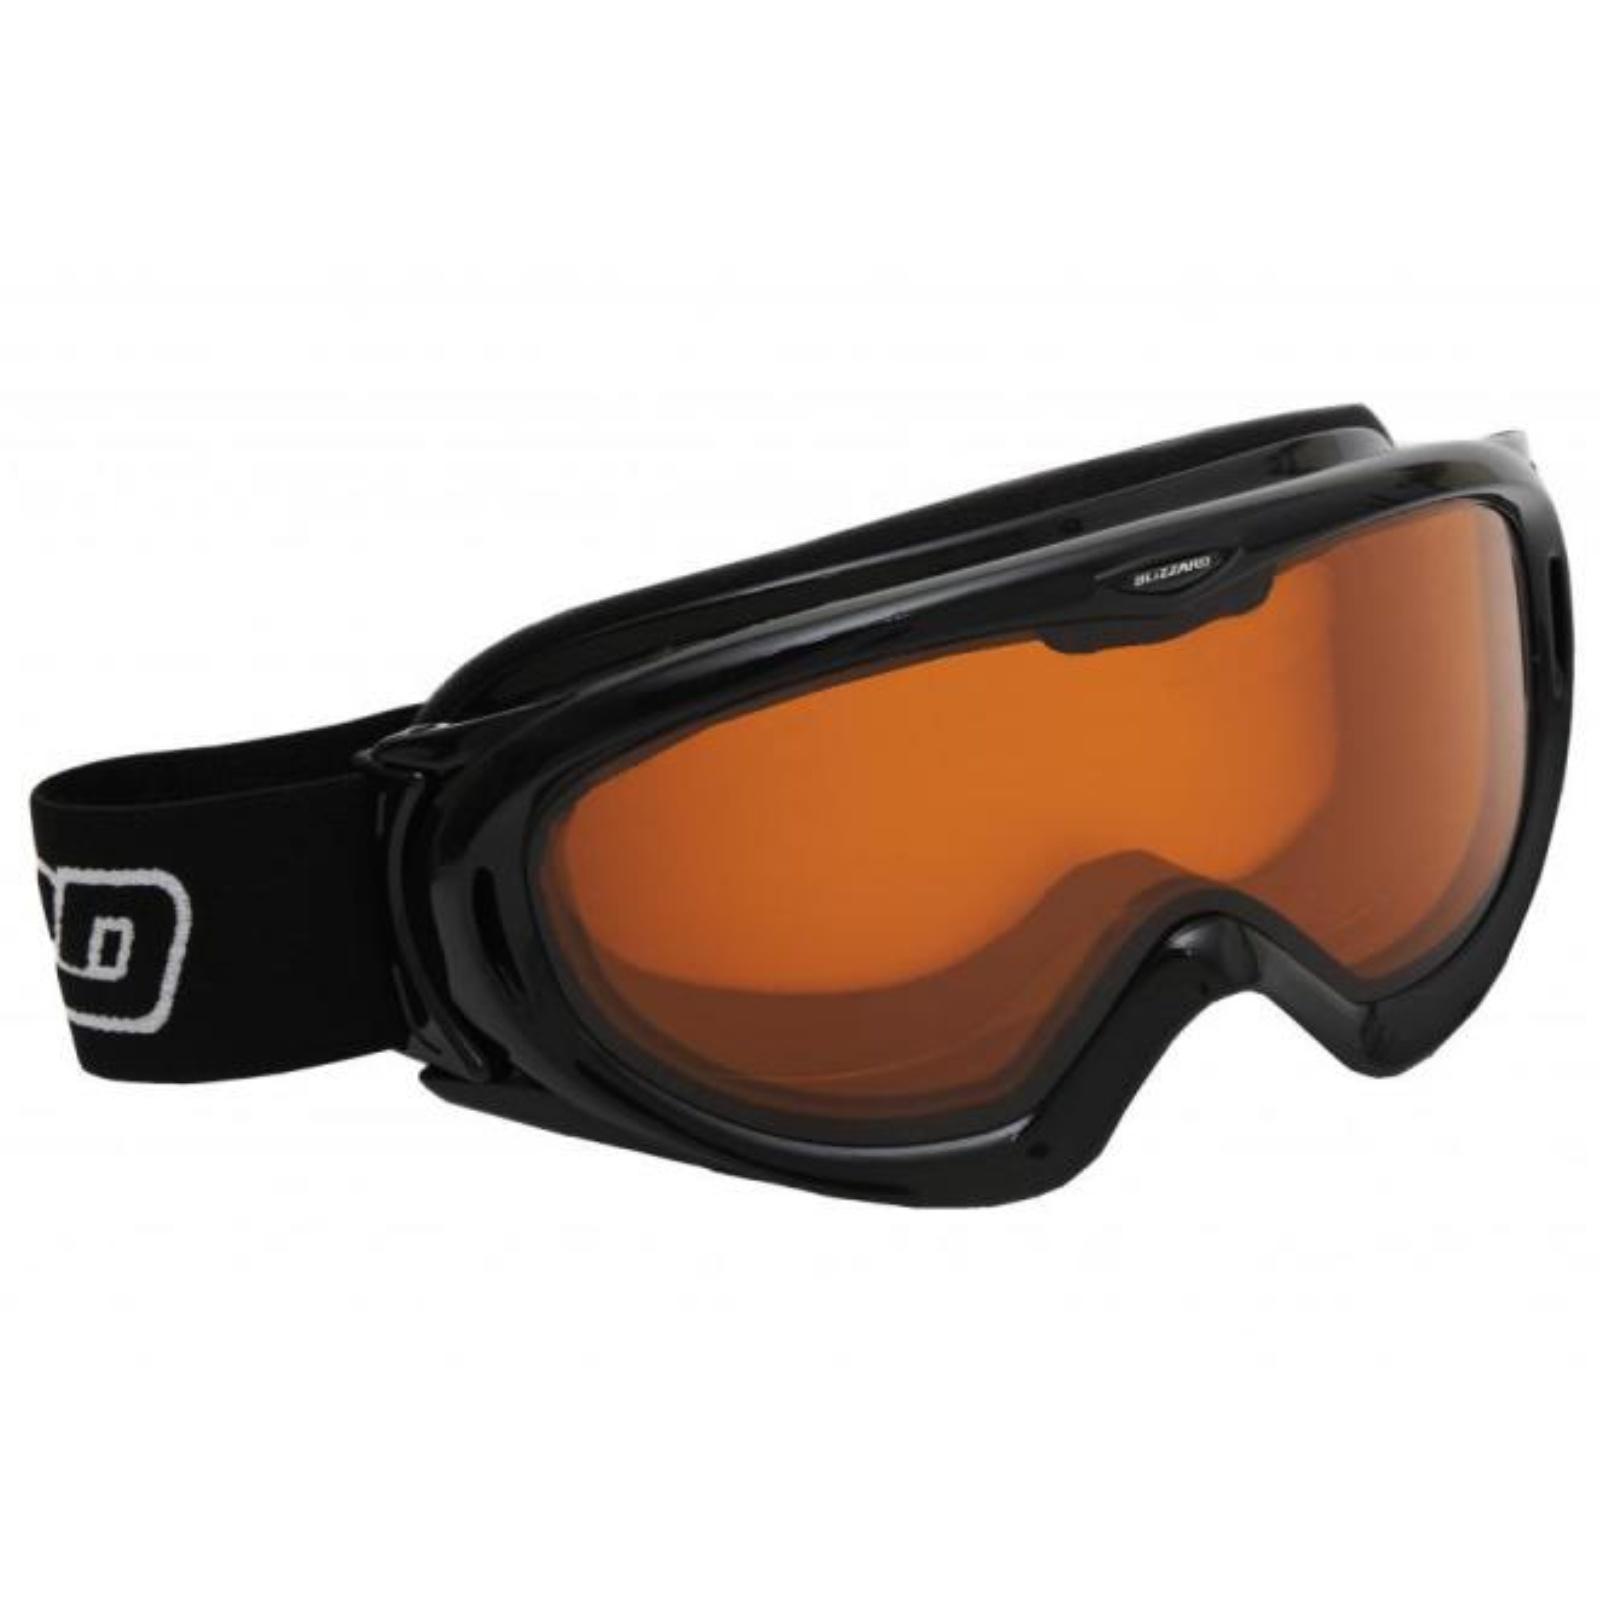 Lyžařské brýle BLIZZARD 905 DAVO - černé